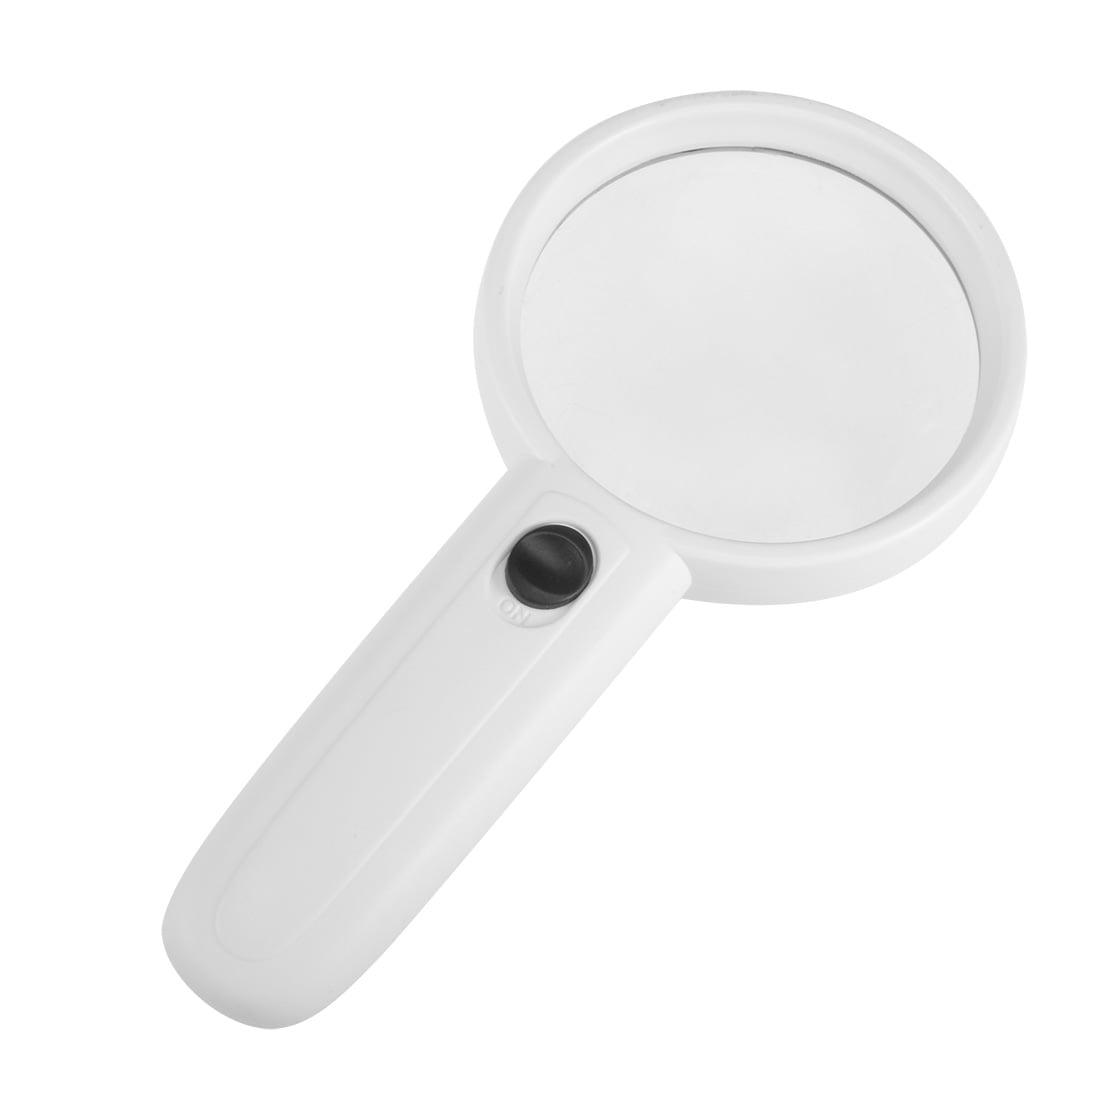 magnifier 2 led light 70mm 3x handheld read magnify glass lens